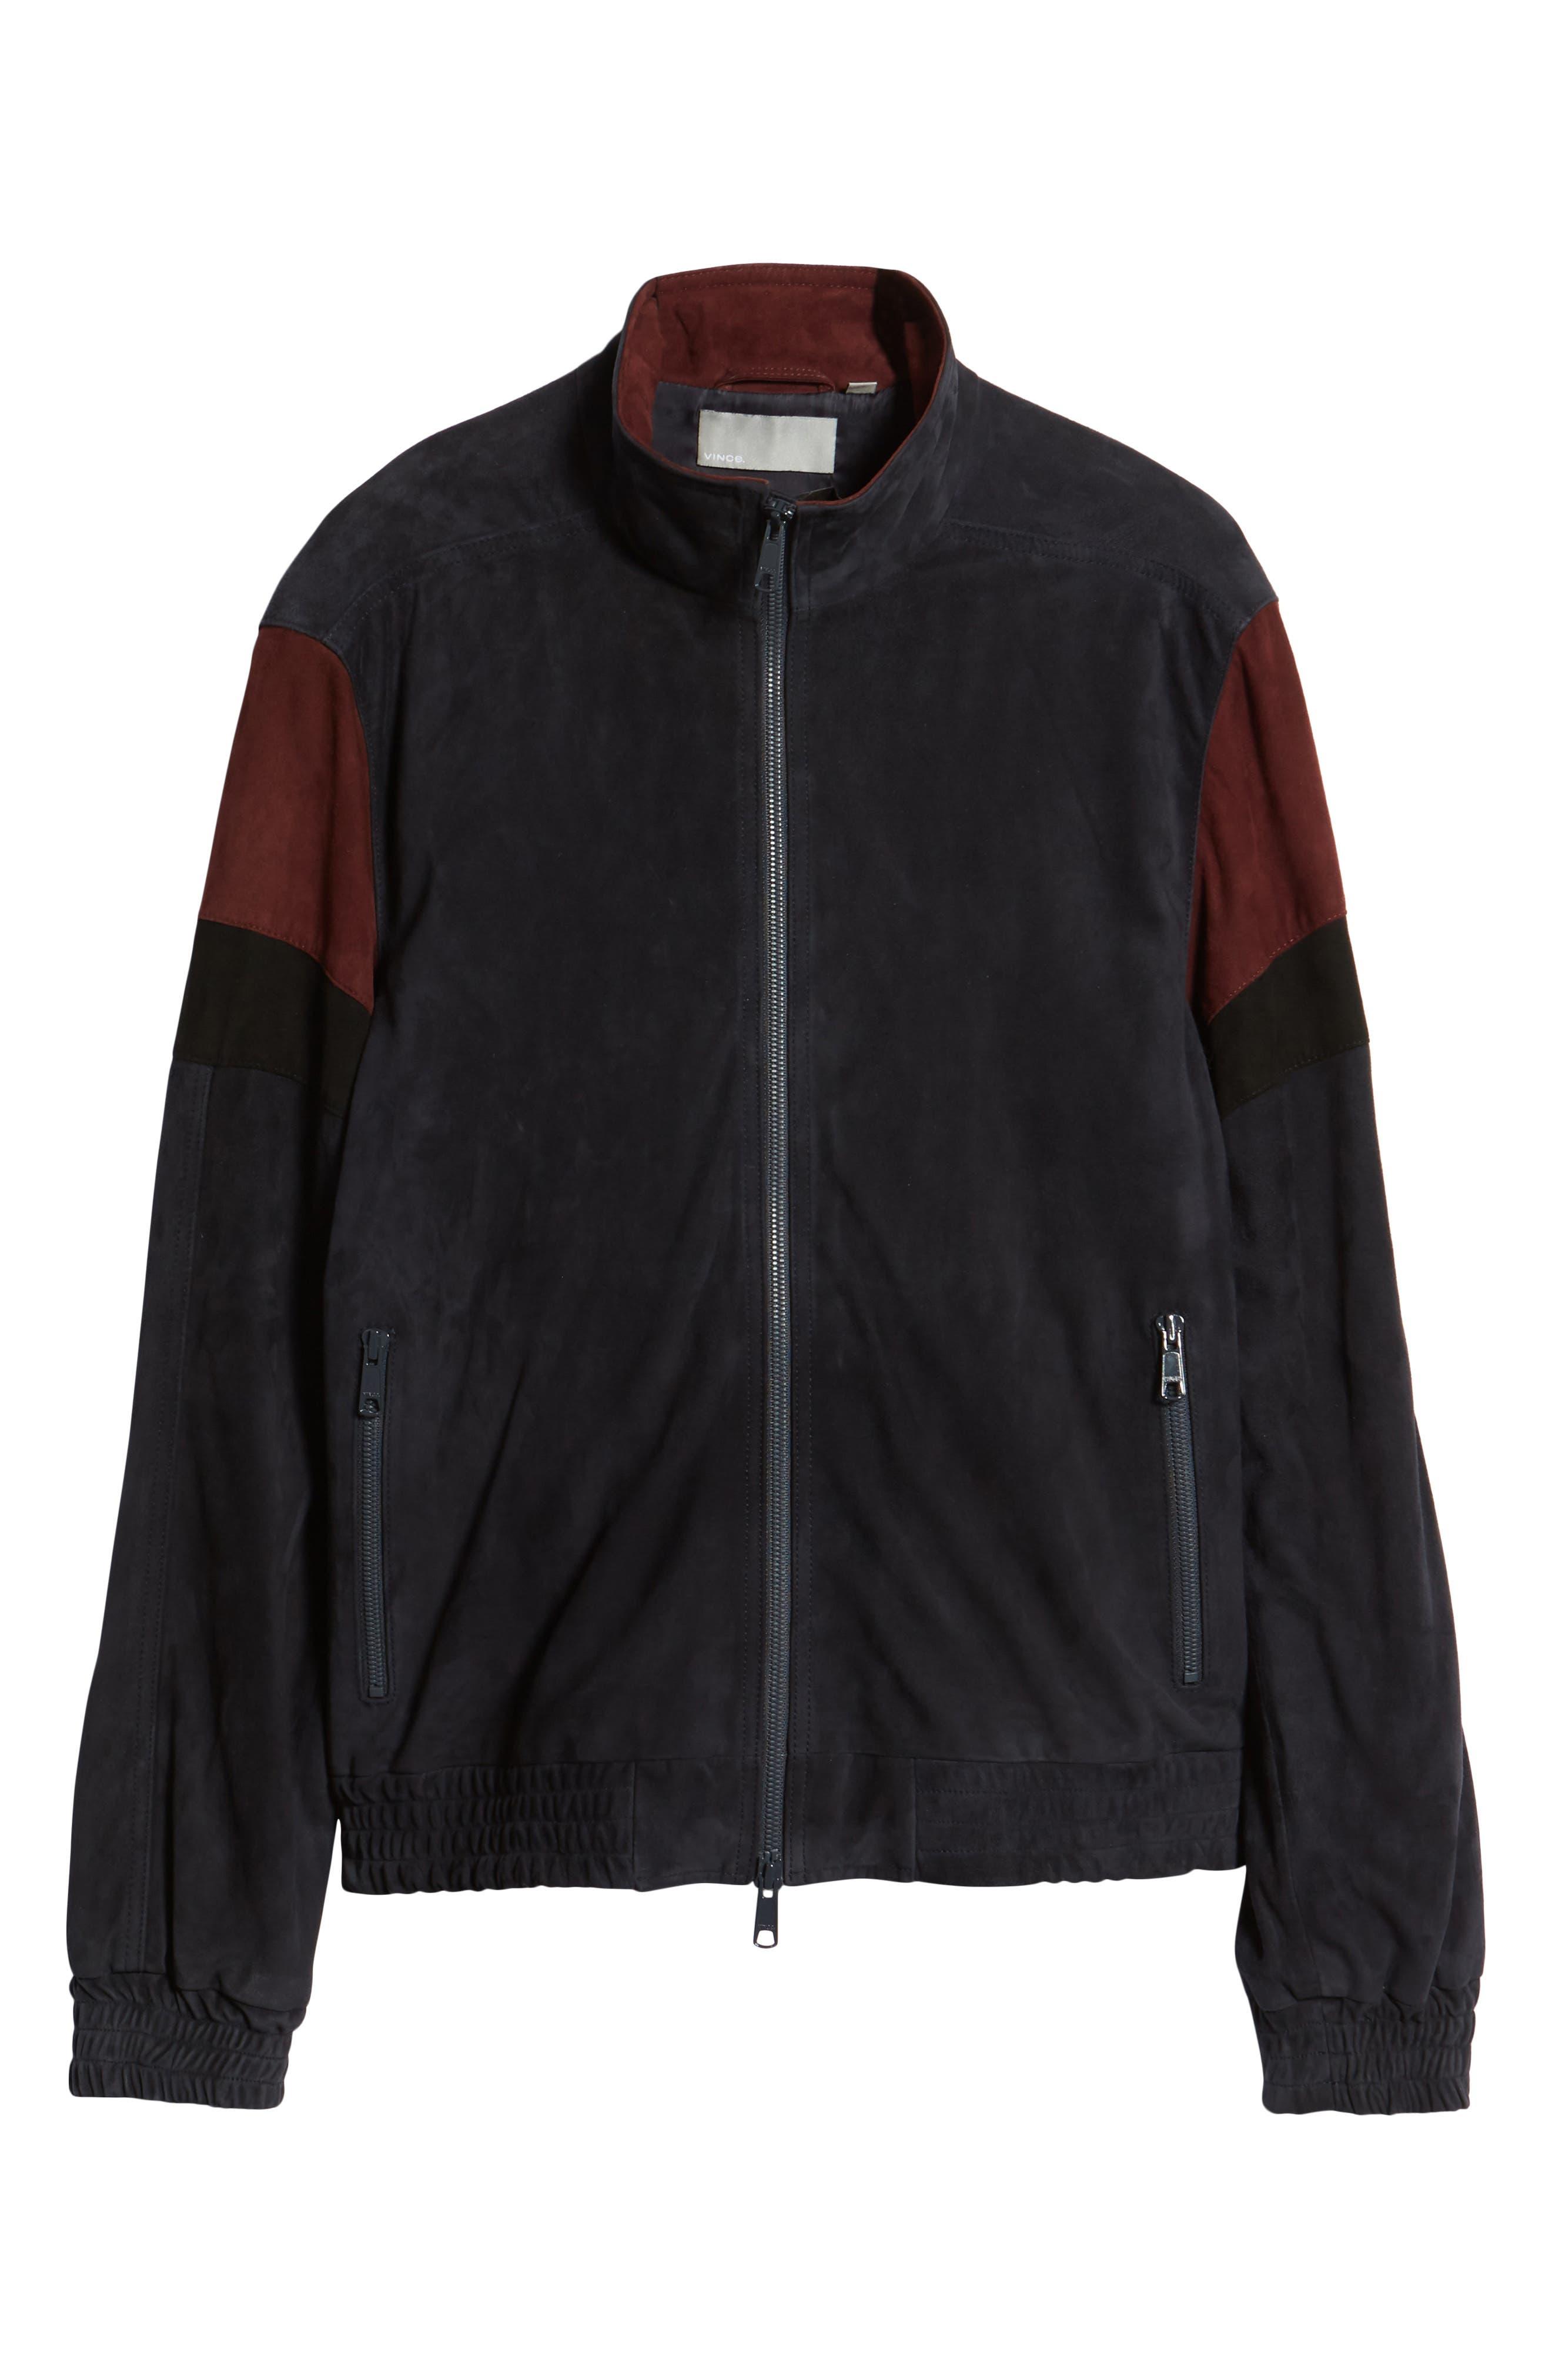 Colorblock Leather Track Jacket,                             Alternate thumbnail 6, color,                             New Coastal